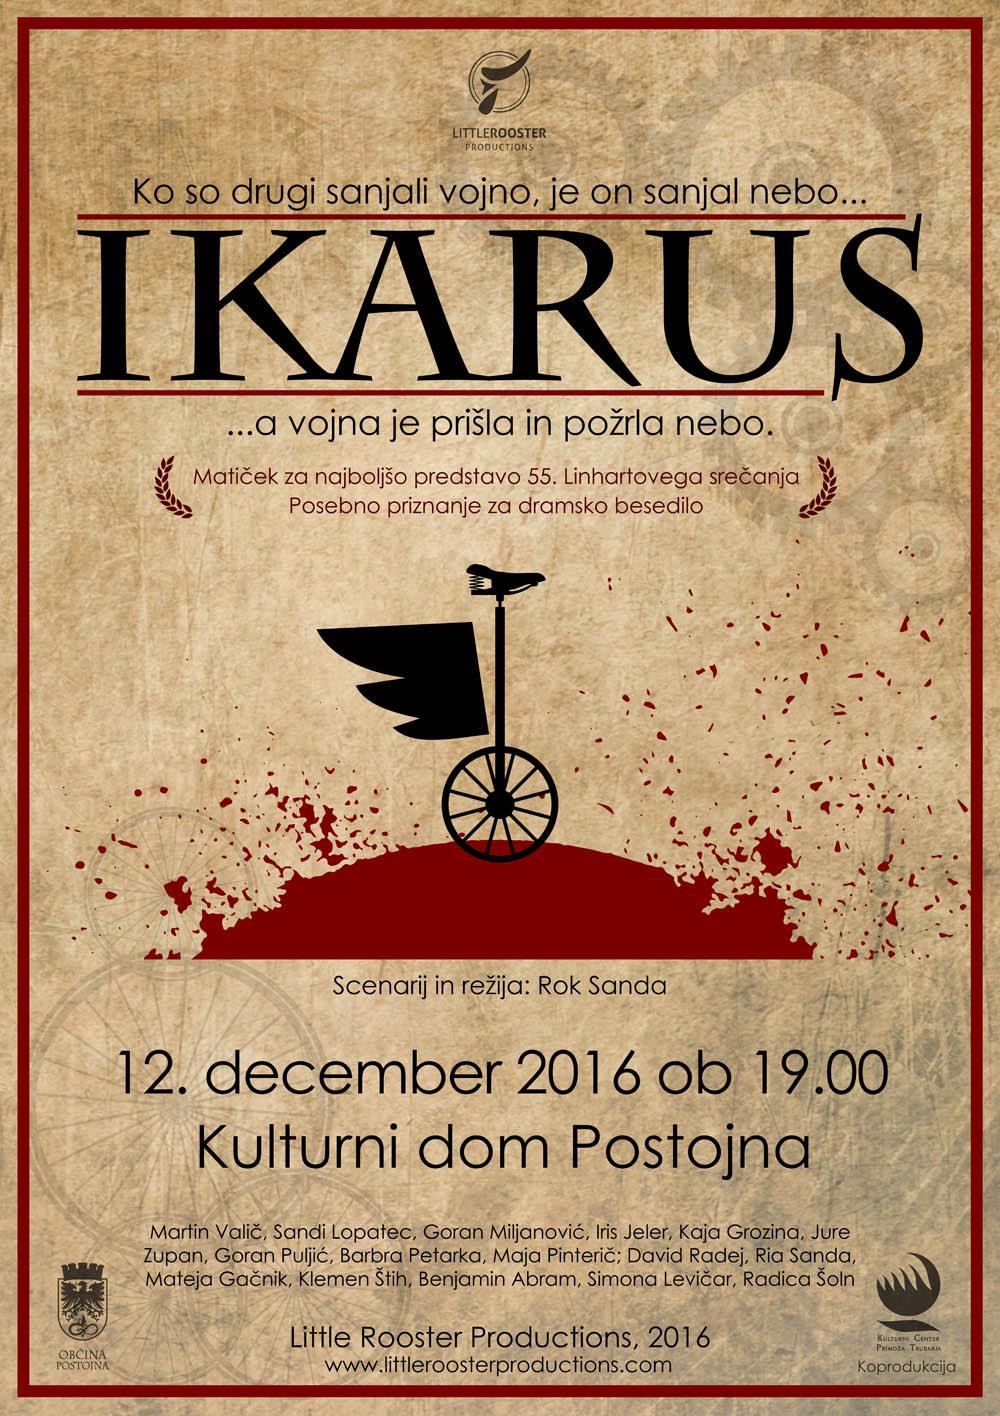 Ikarus cgp_plakat Postojna december 2016.jpg